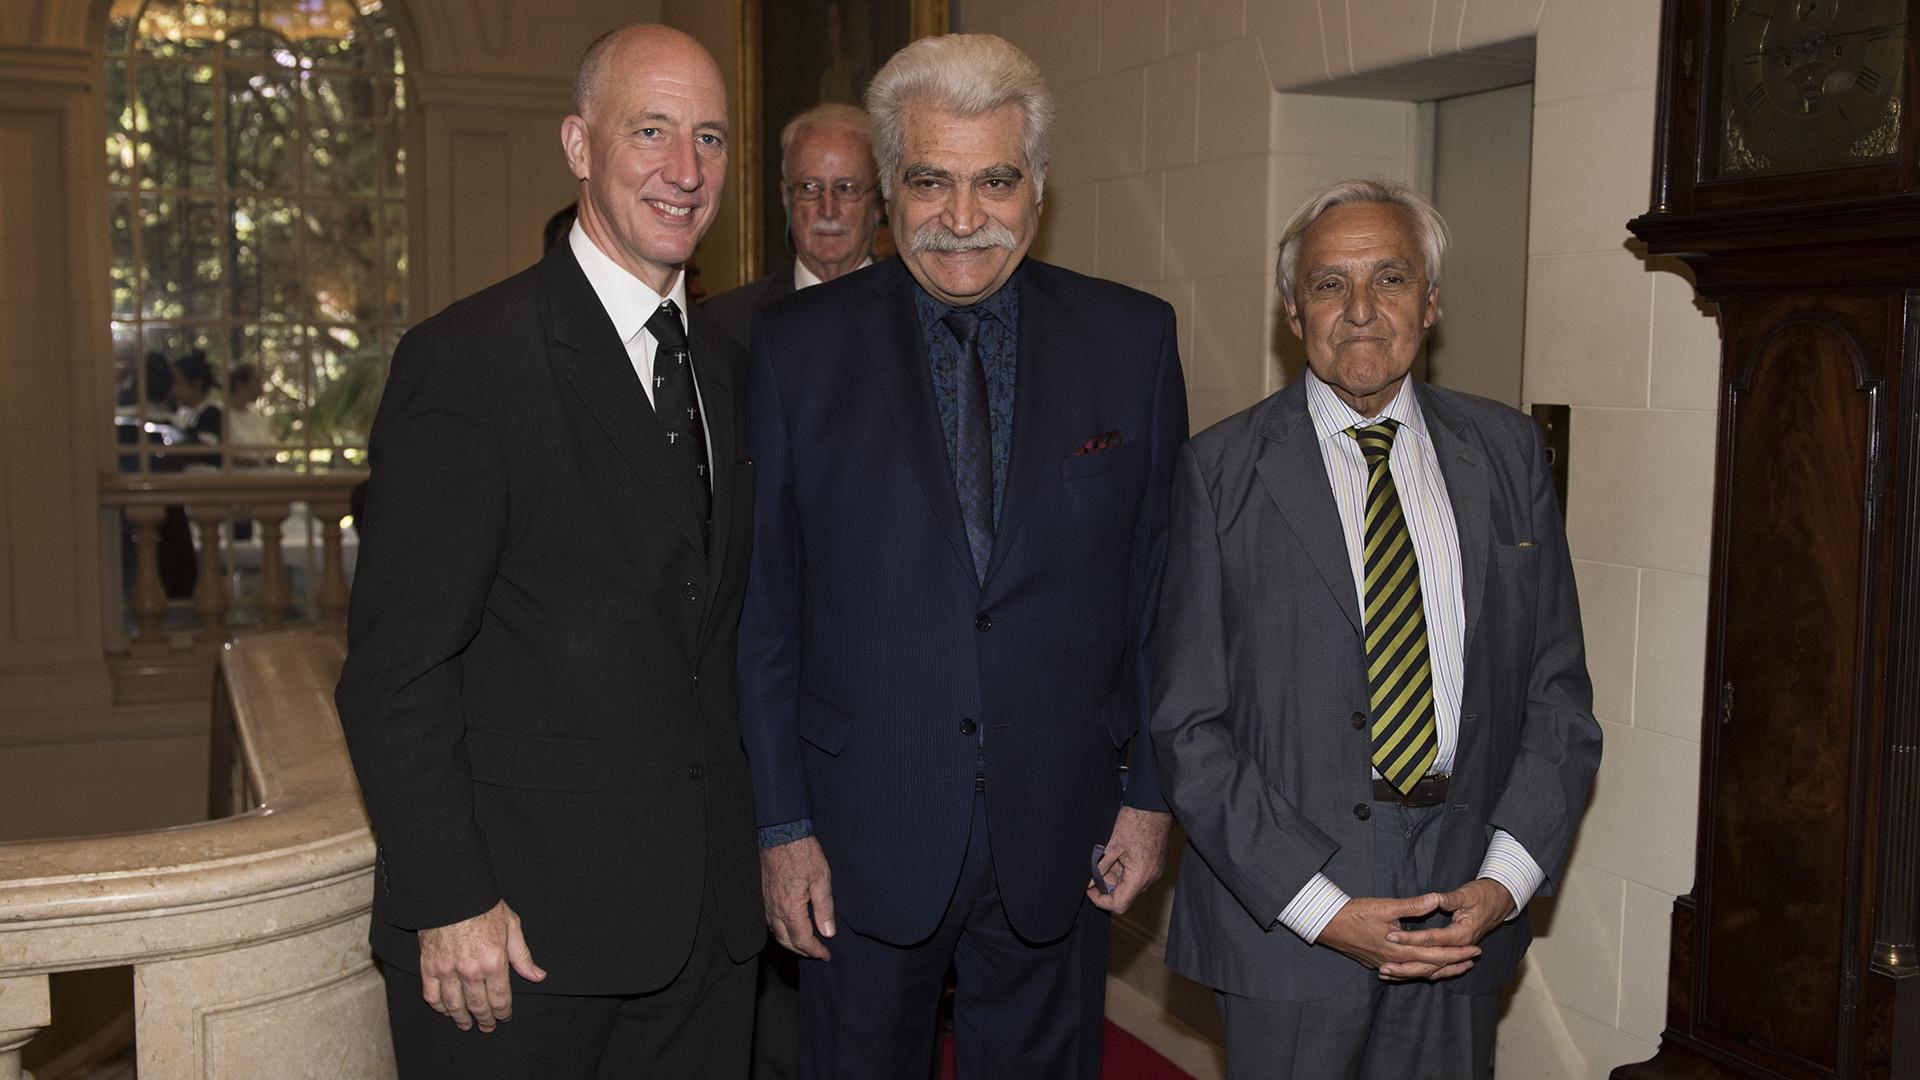 Mark Kent, Jorge Asís y Rosendo Fraga